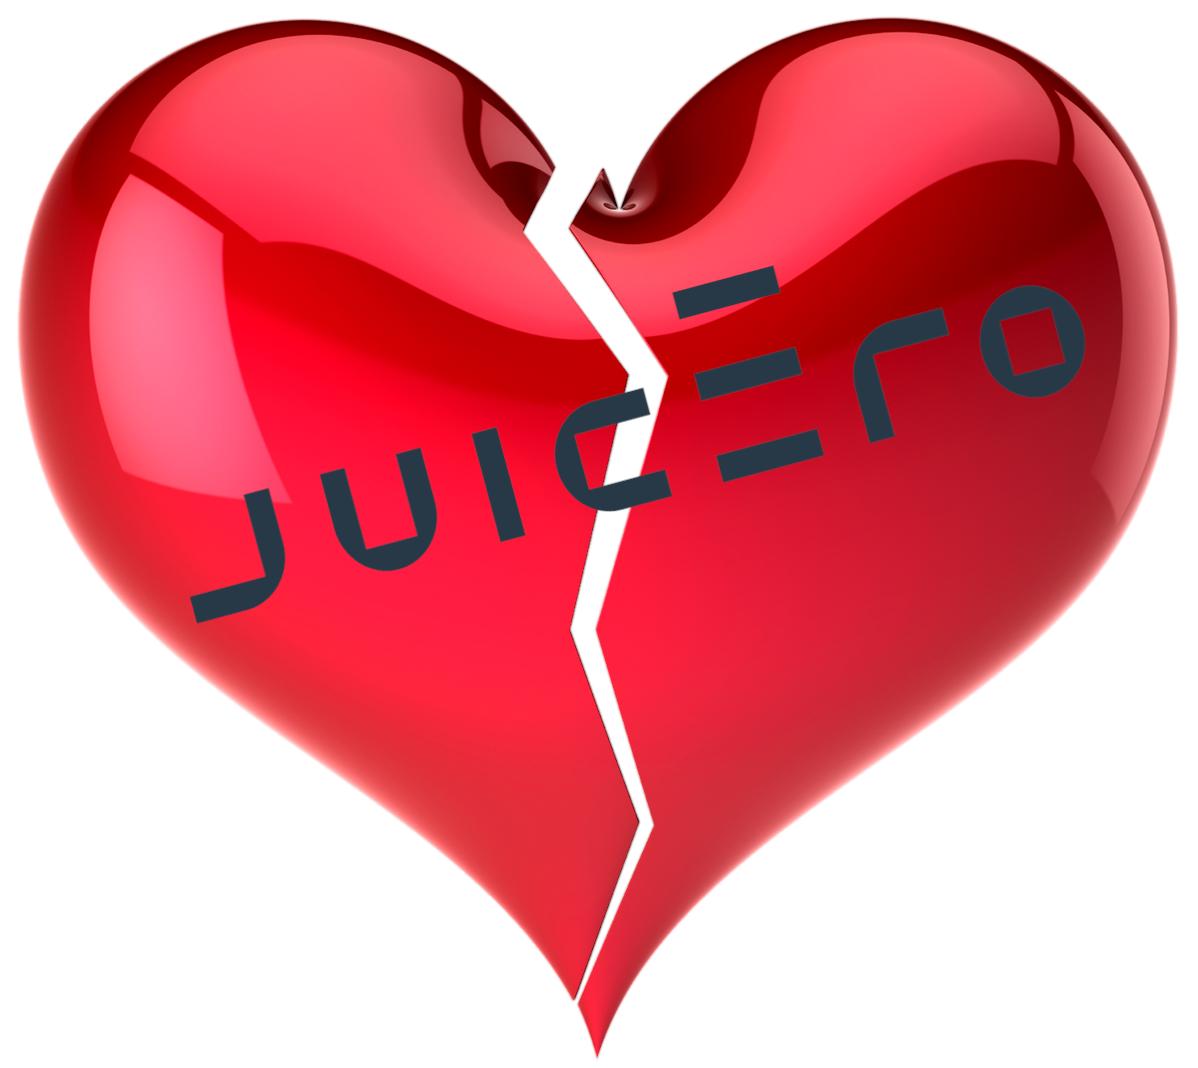 Am I Next? Juicero craters as CEO parties at Burning Man.